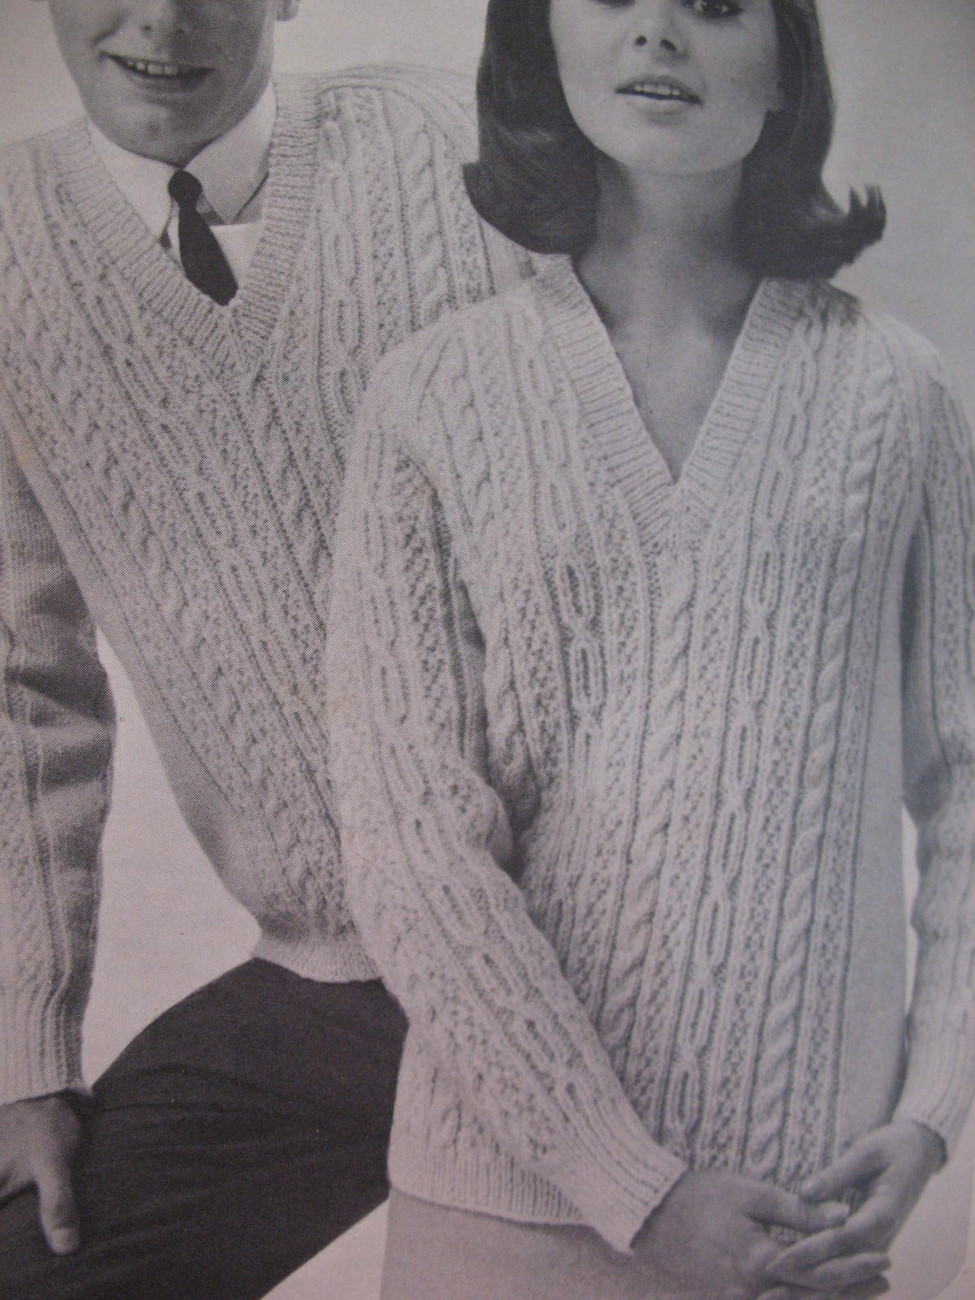 Vintage Patons Raglan Knitting Patterns Sweaters Dresses image 3